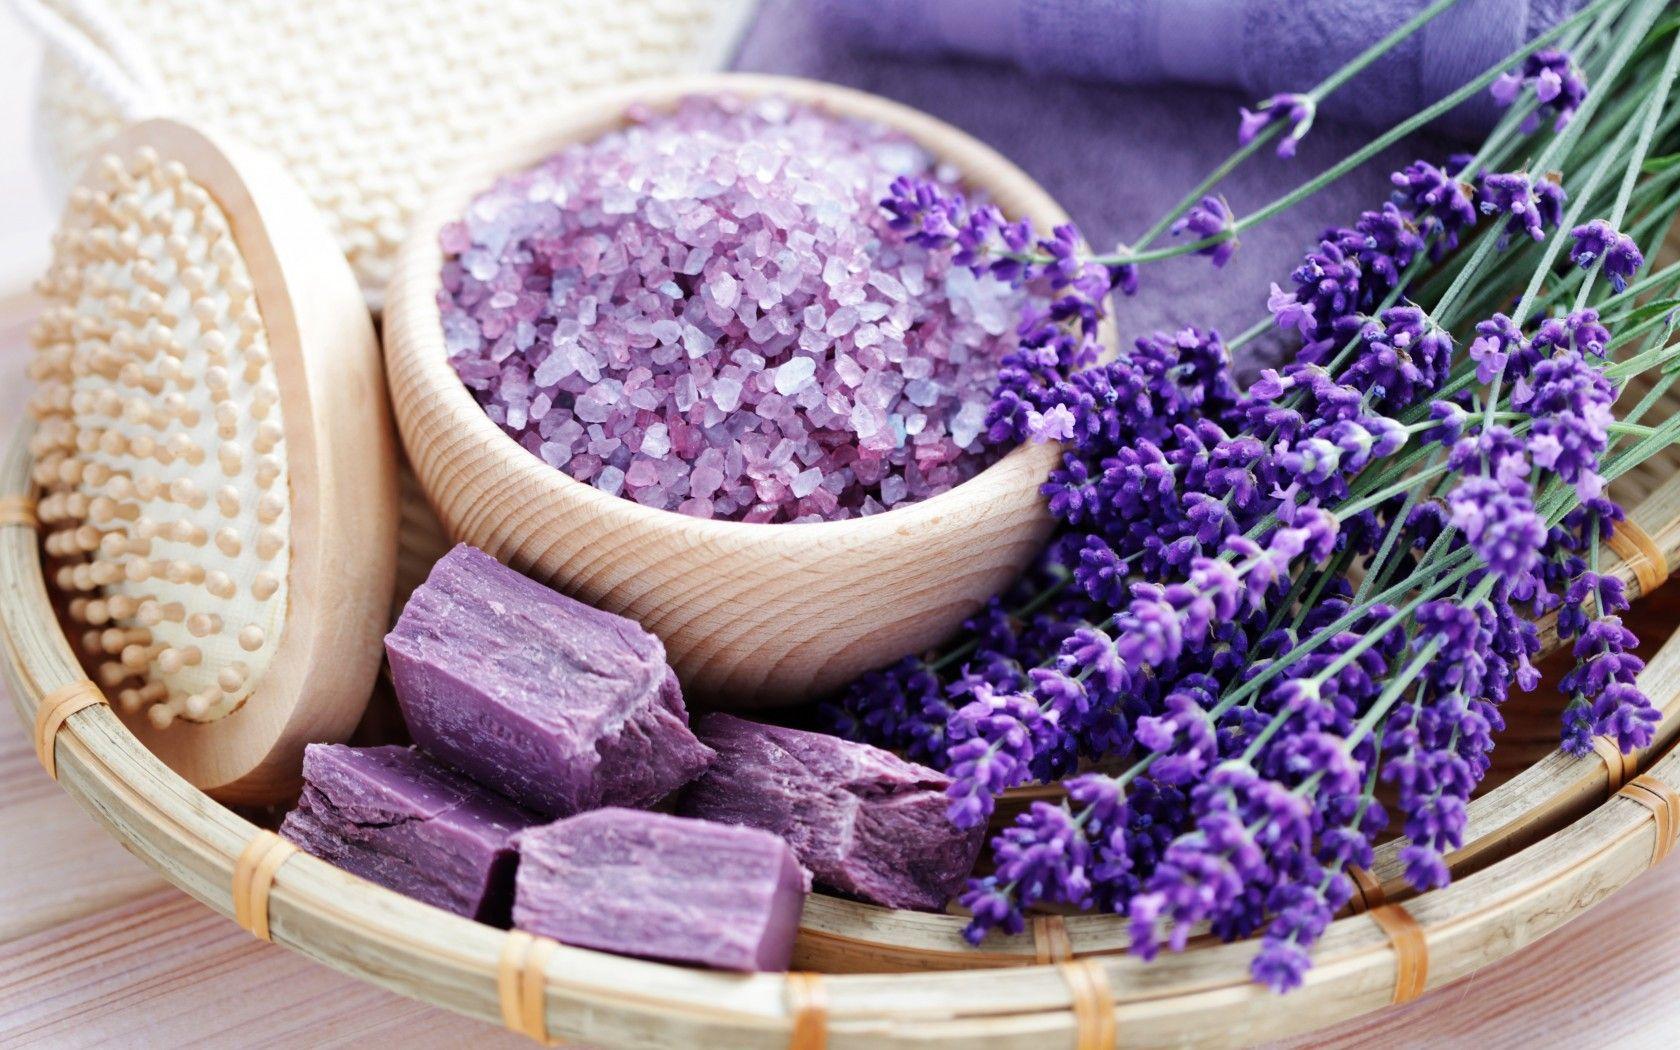 spa_soap_lavender_salt_relax_flowers_natural